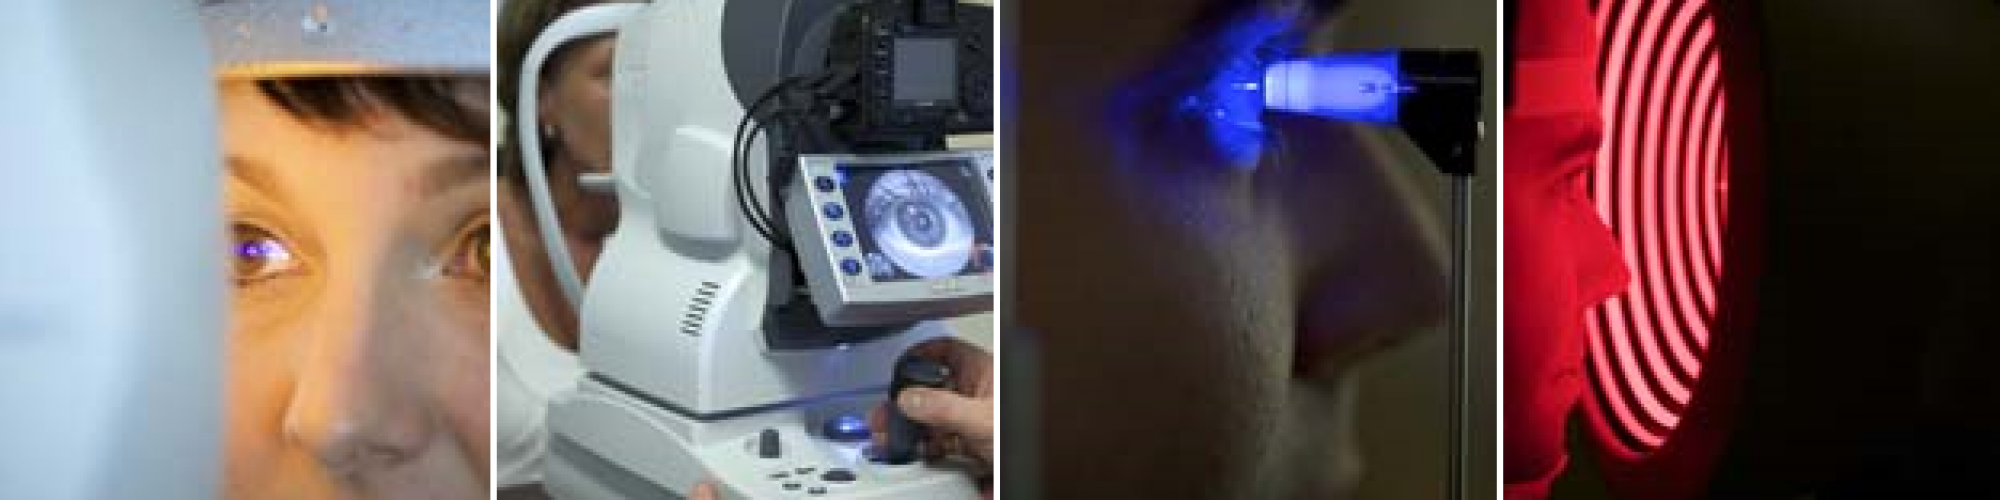 Augenarztpraxis Daniela Michaelis